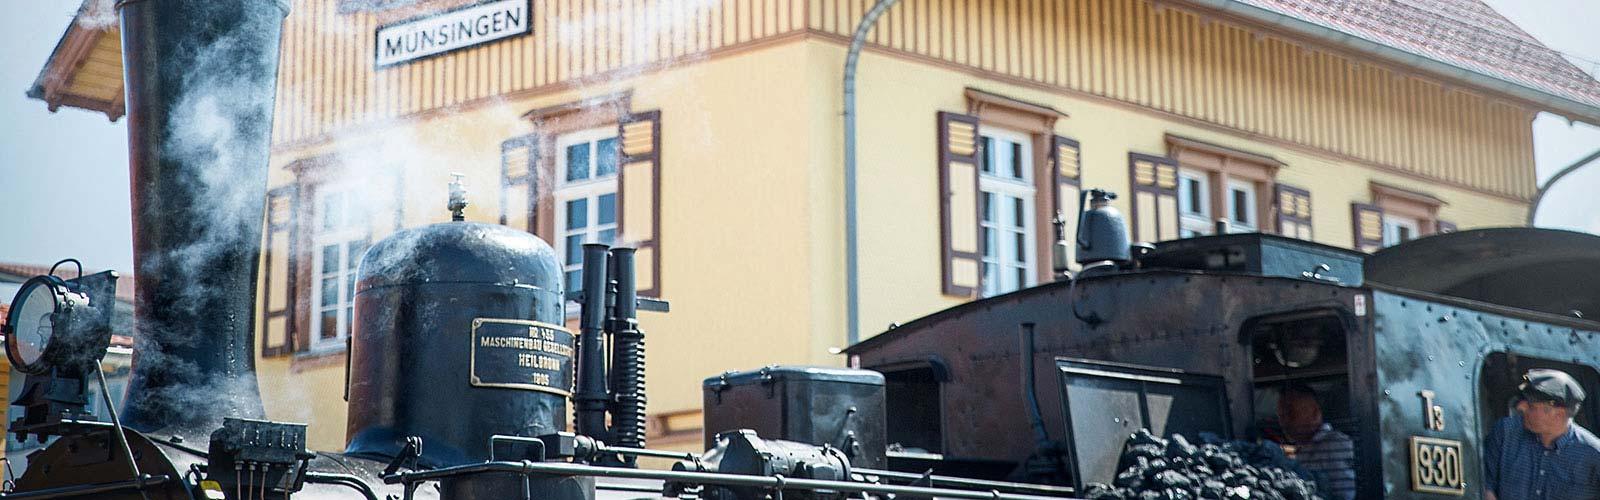 Dampflok-Bahnhof